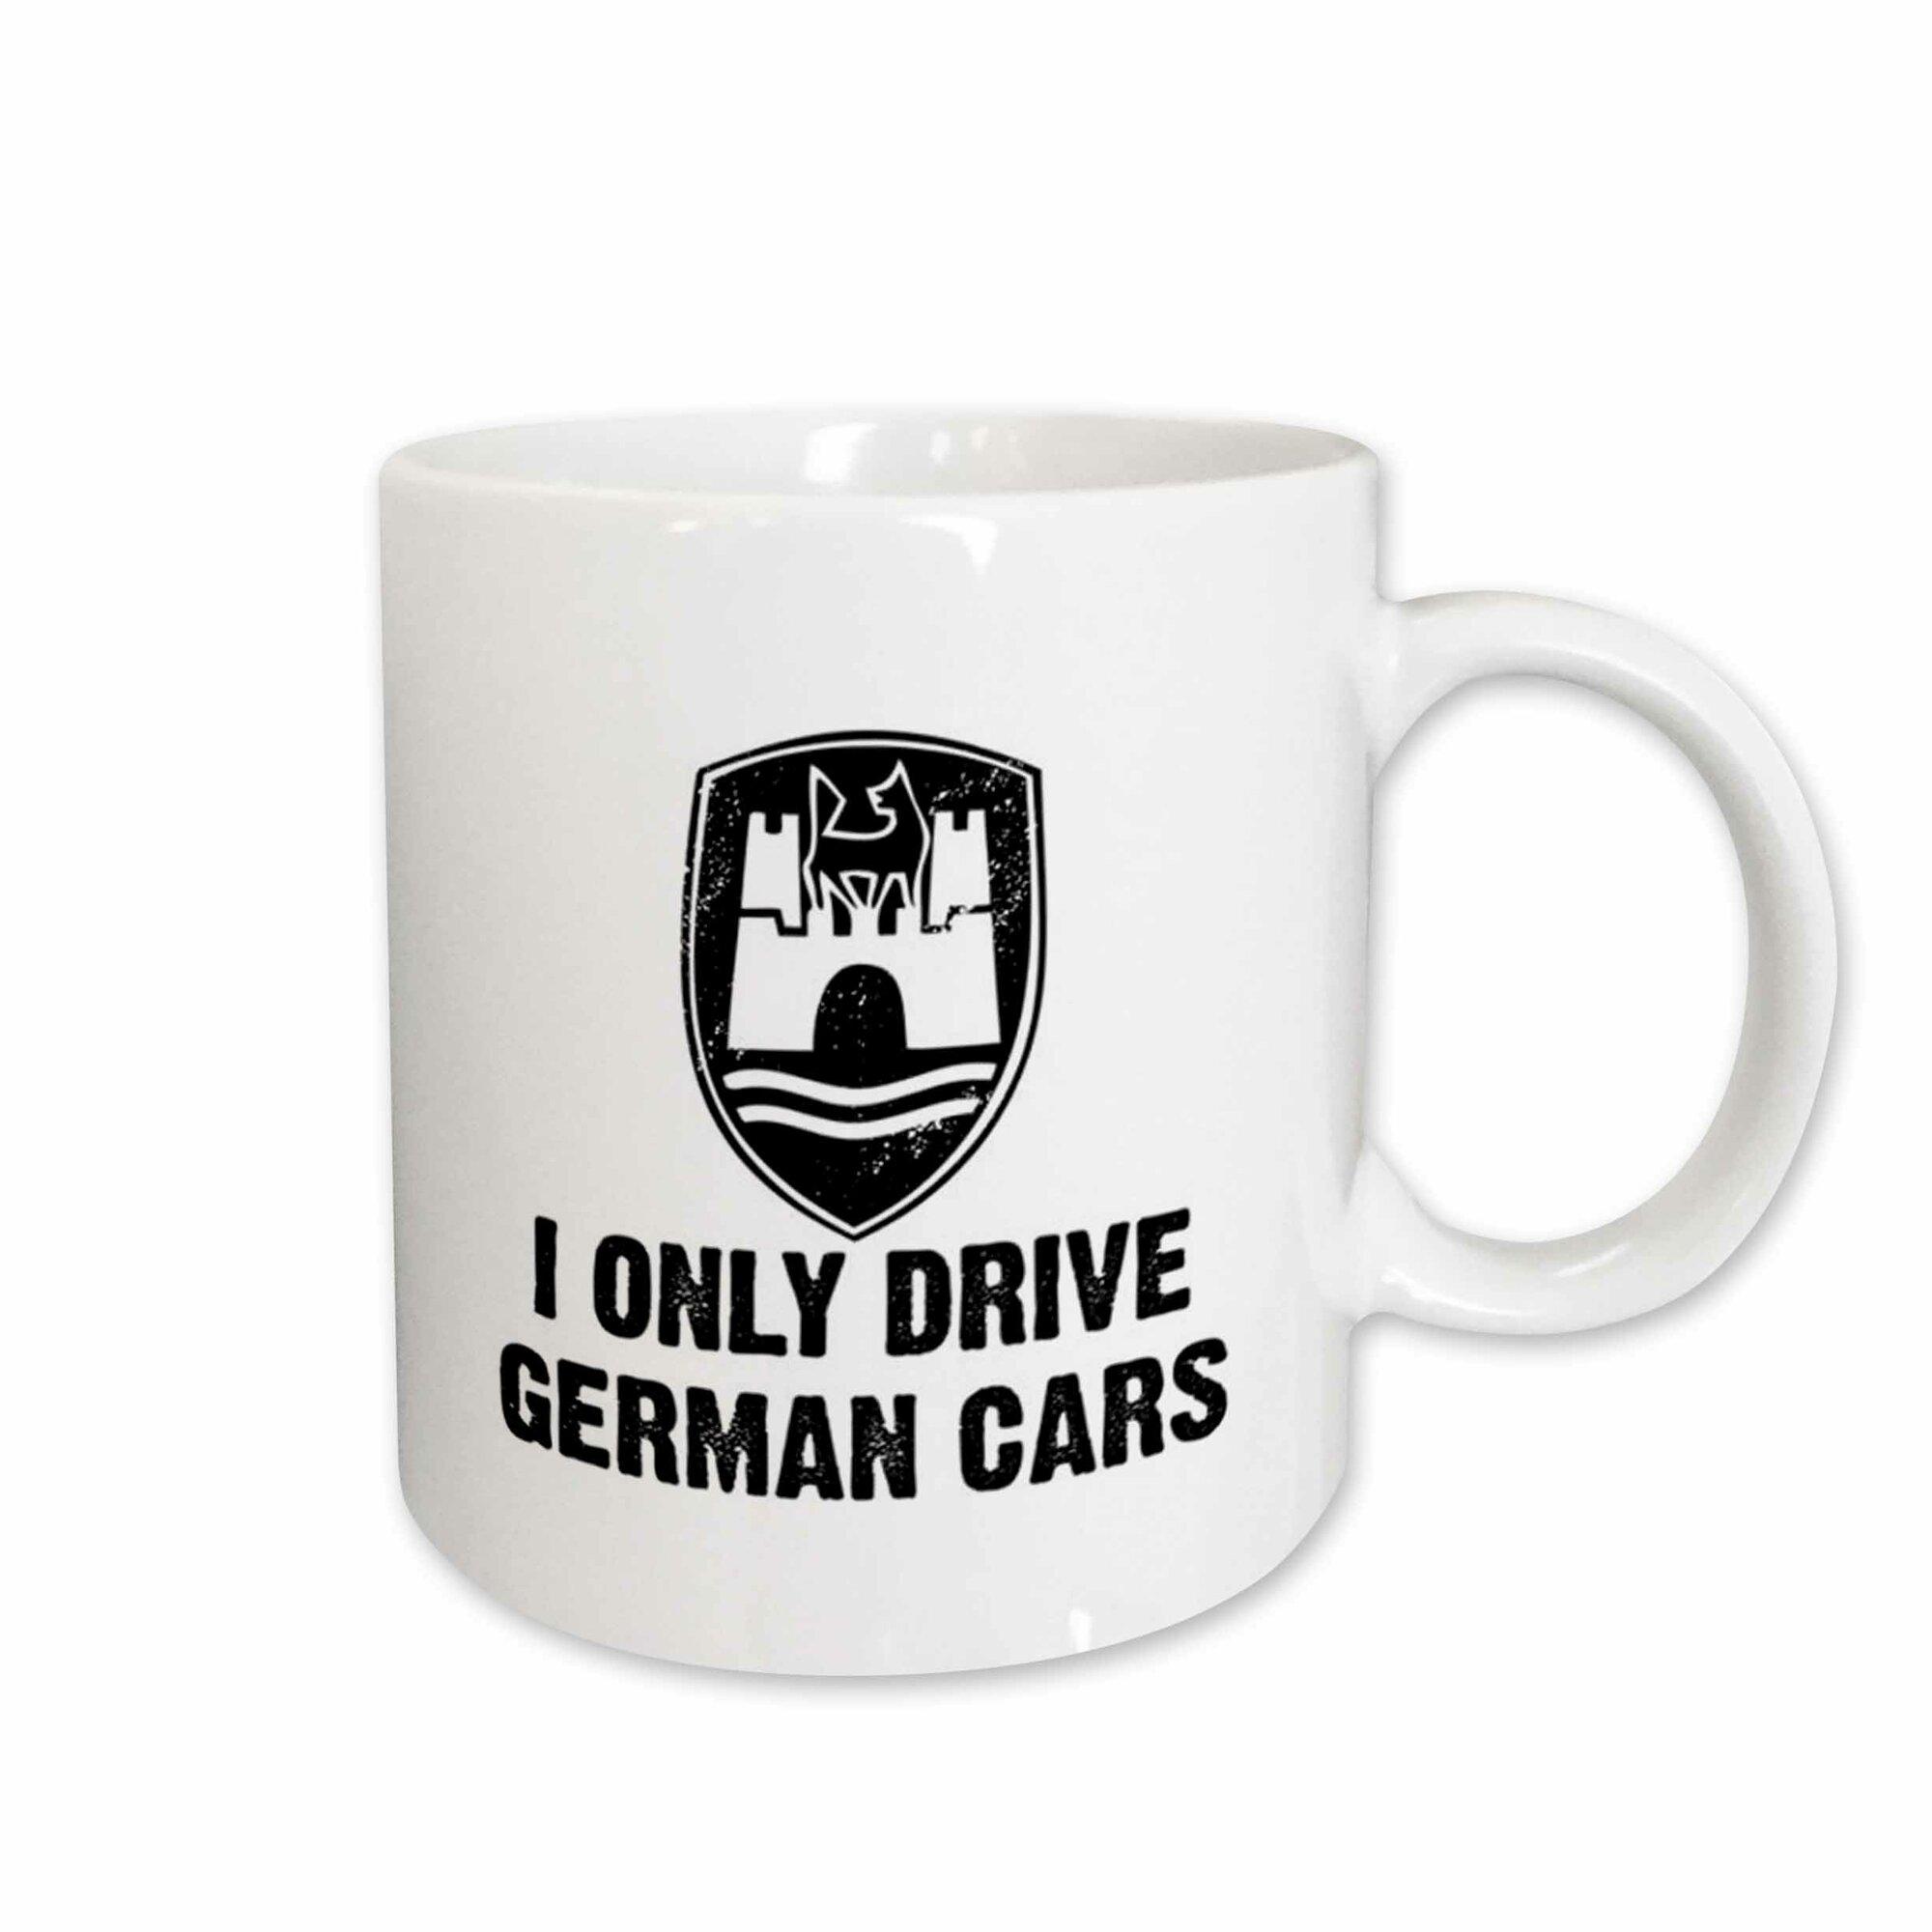 East Urban Home I Only Drive German Cars Coffee Mug 190967456573 Ebay